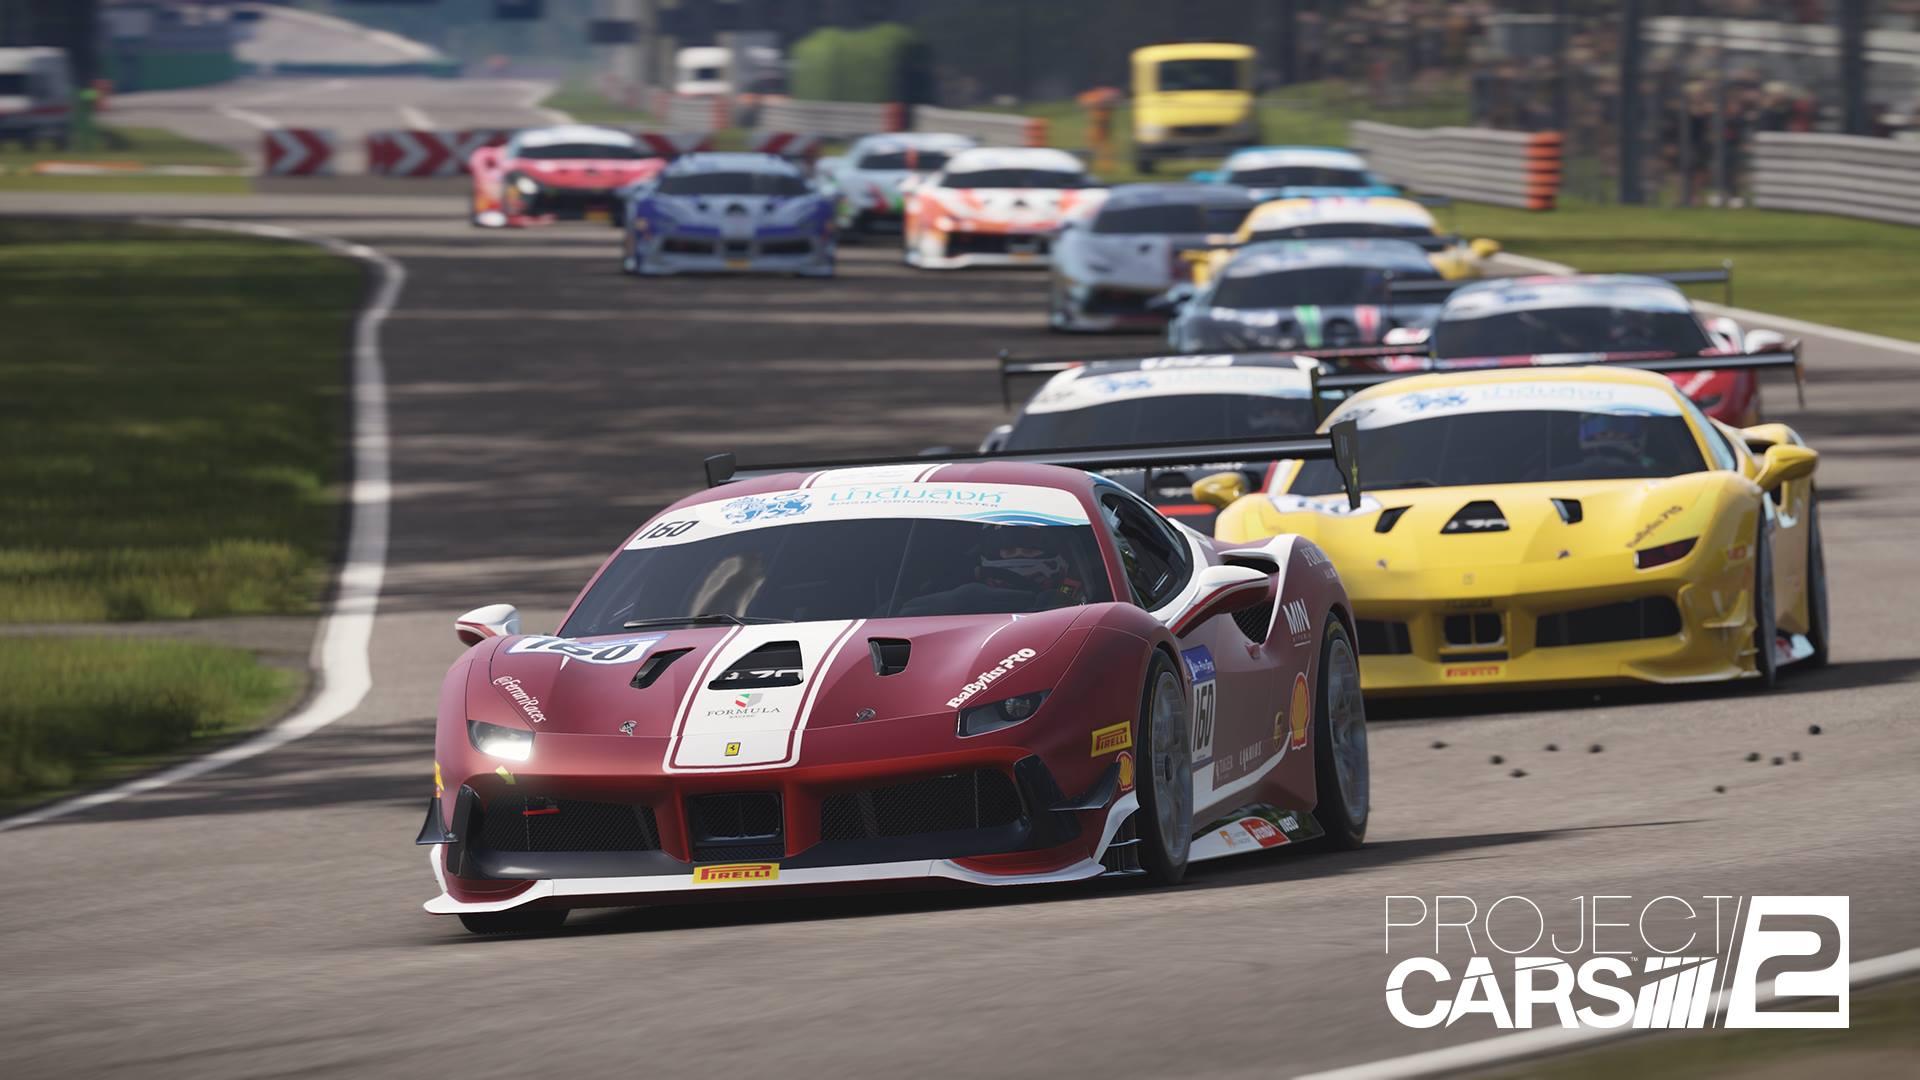 Ferrari 488 Challenge Heads List Project Cars 2 Update Notes ...